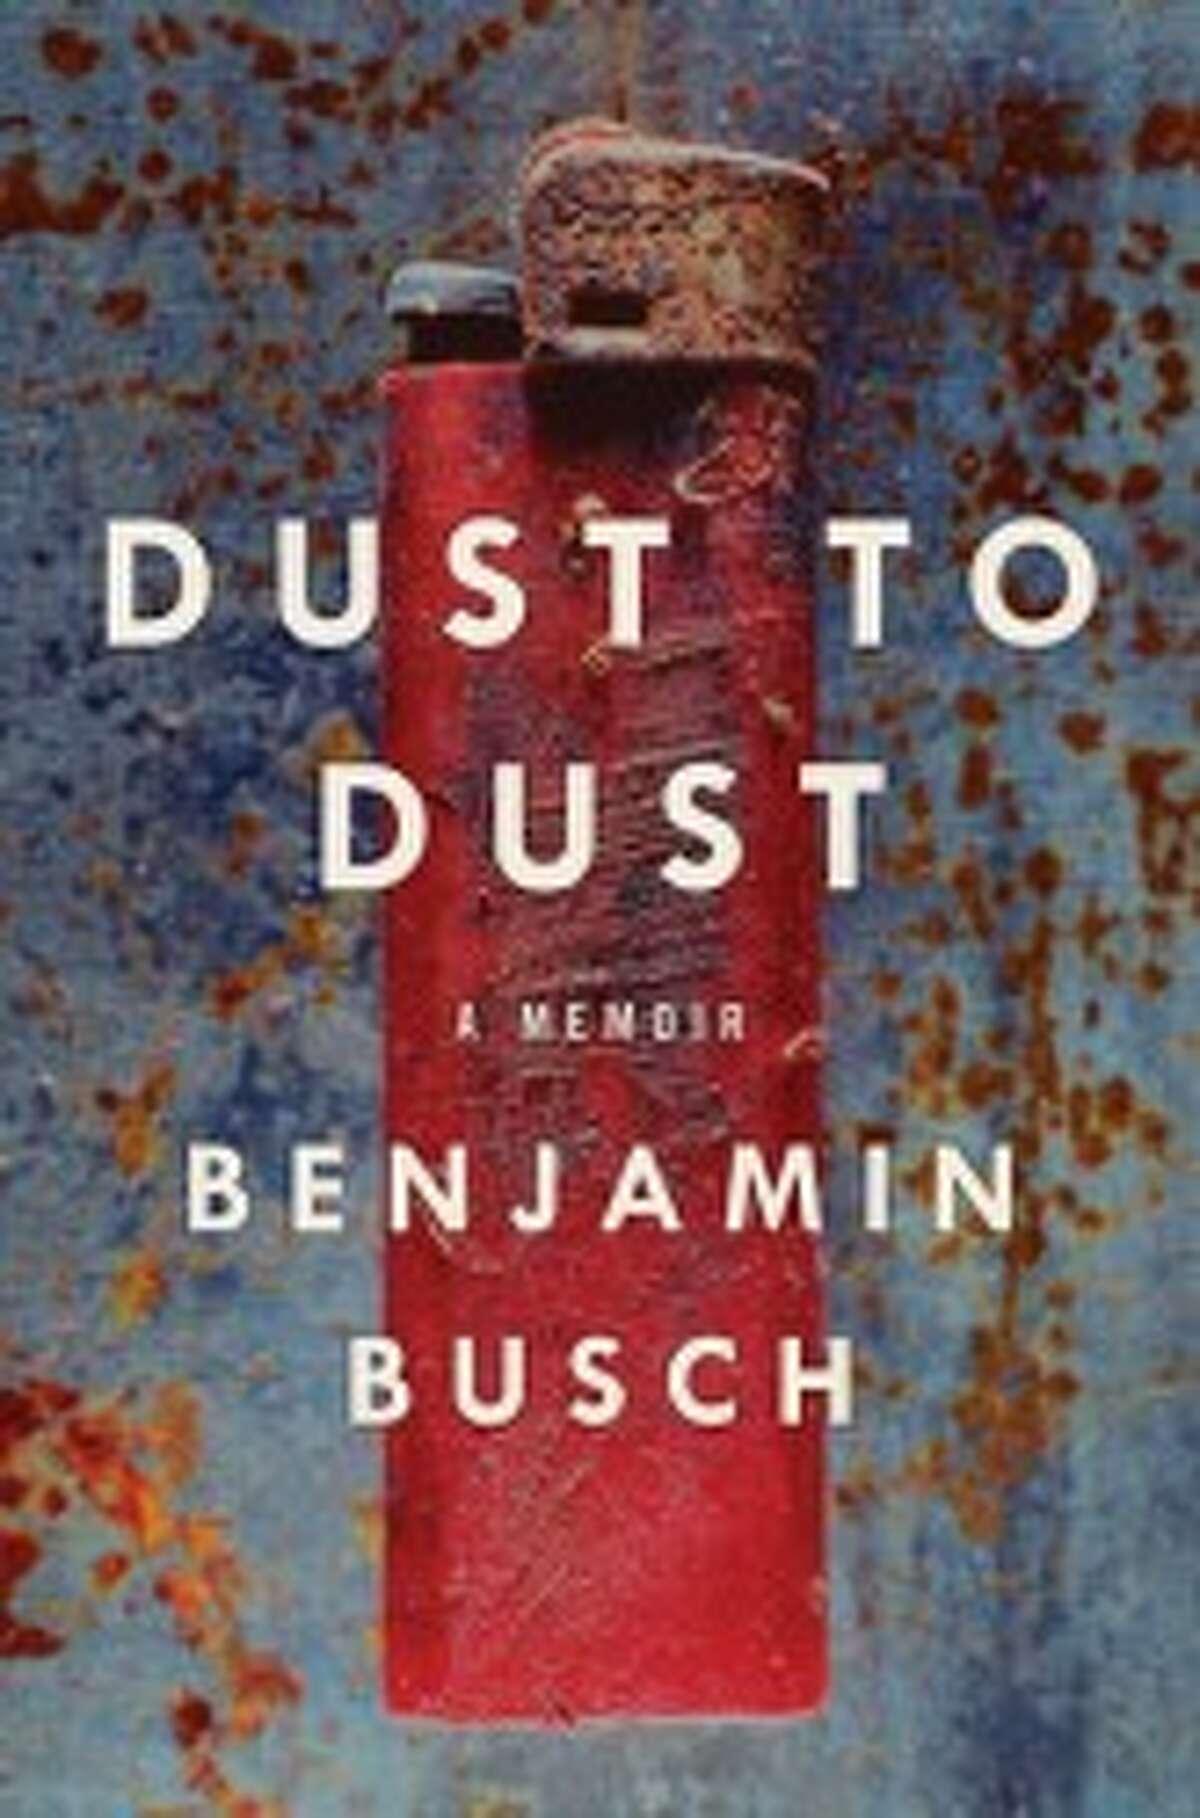 DUST TO DUST: A memoir by Benjamin Busch